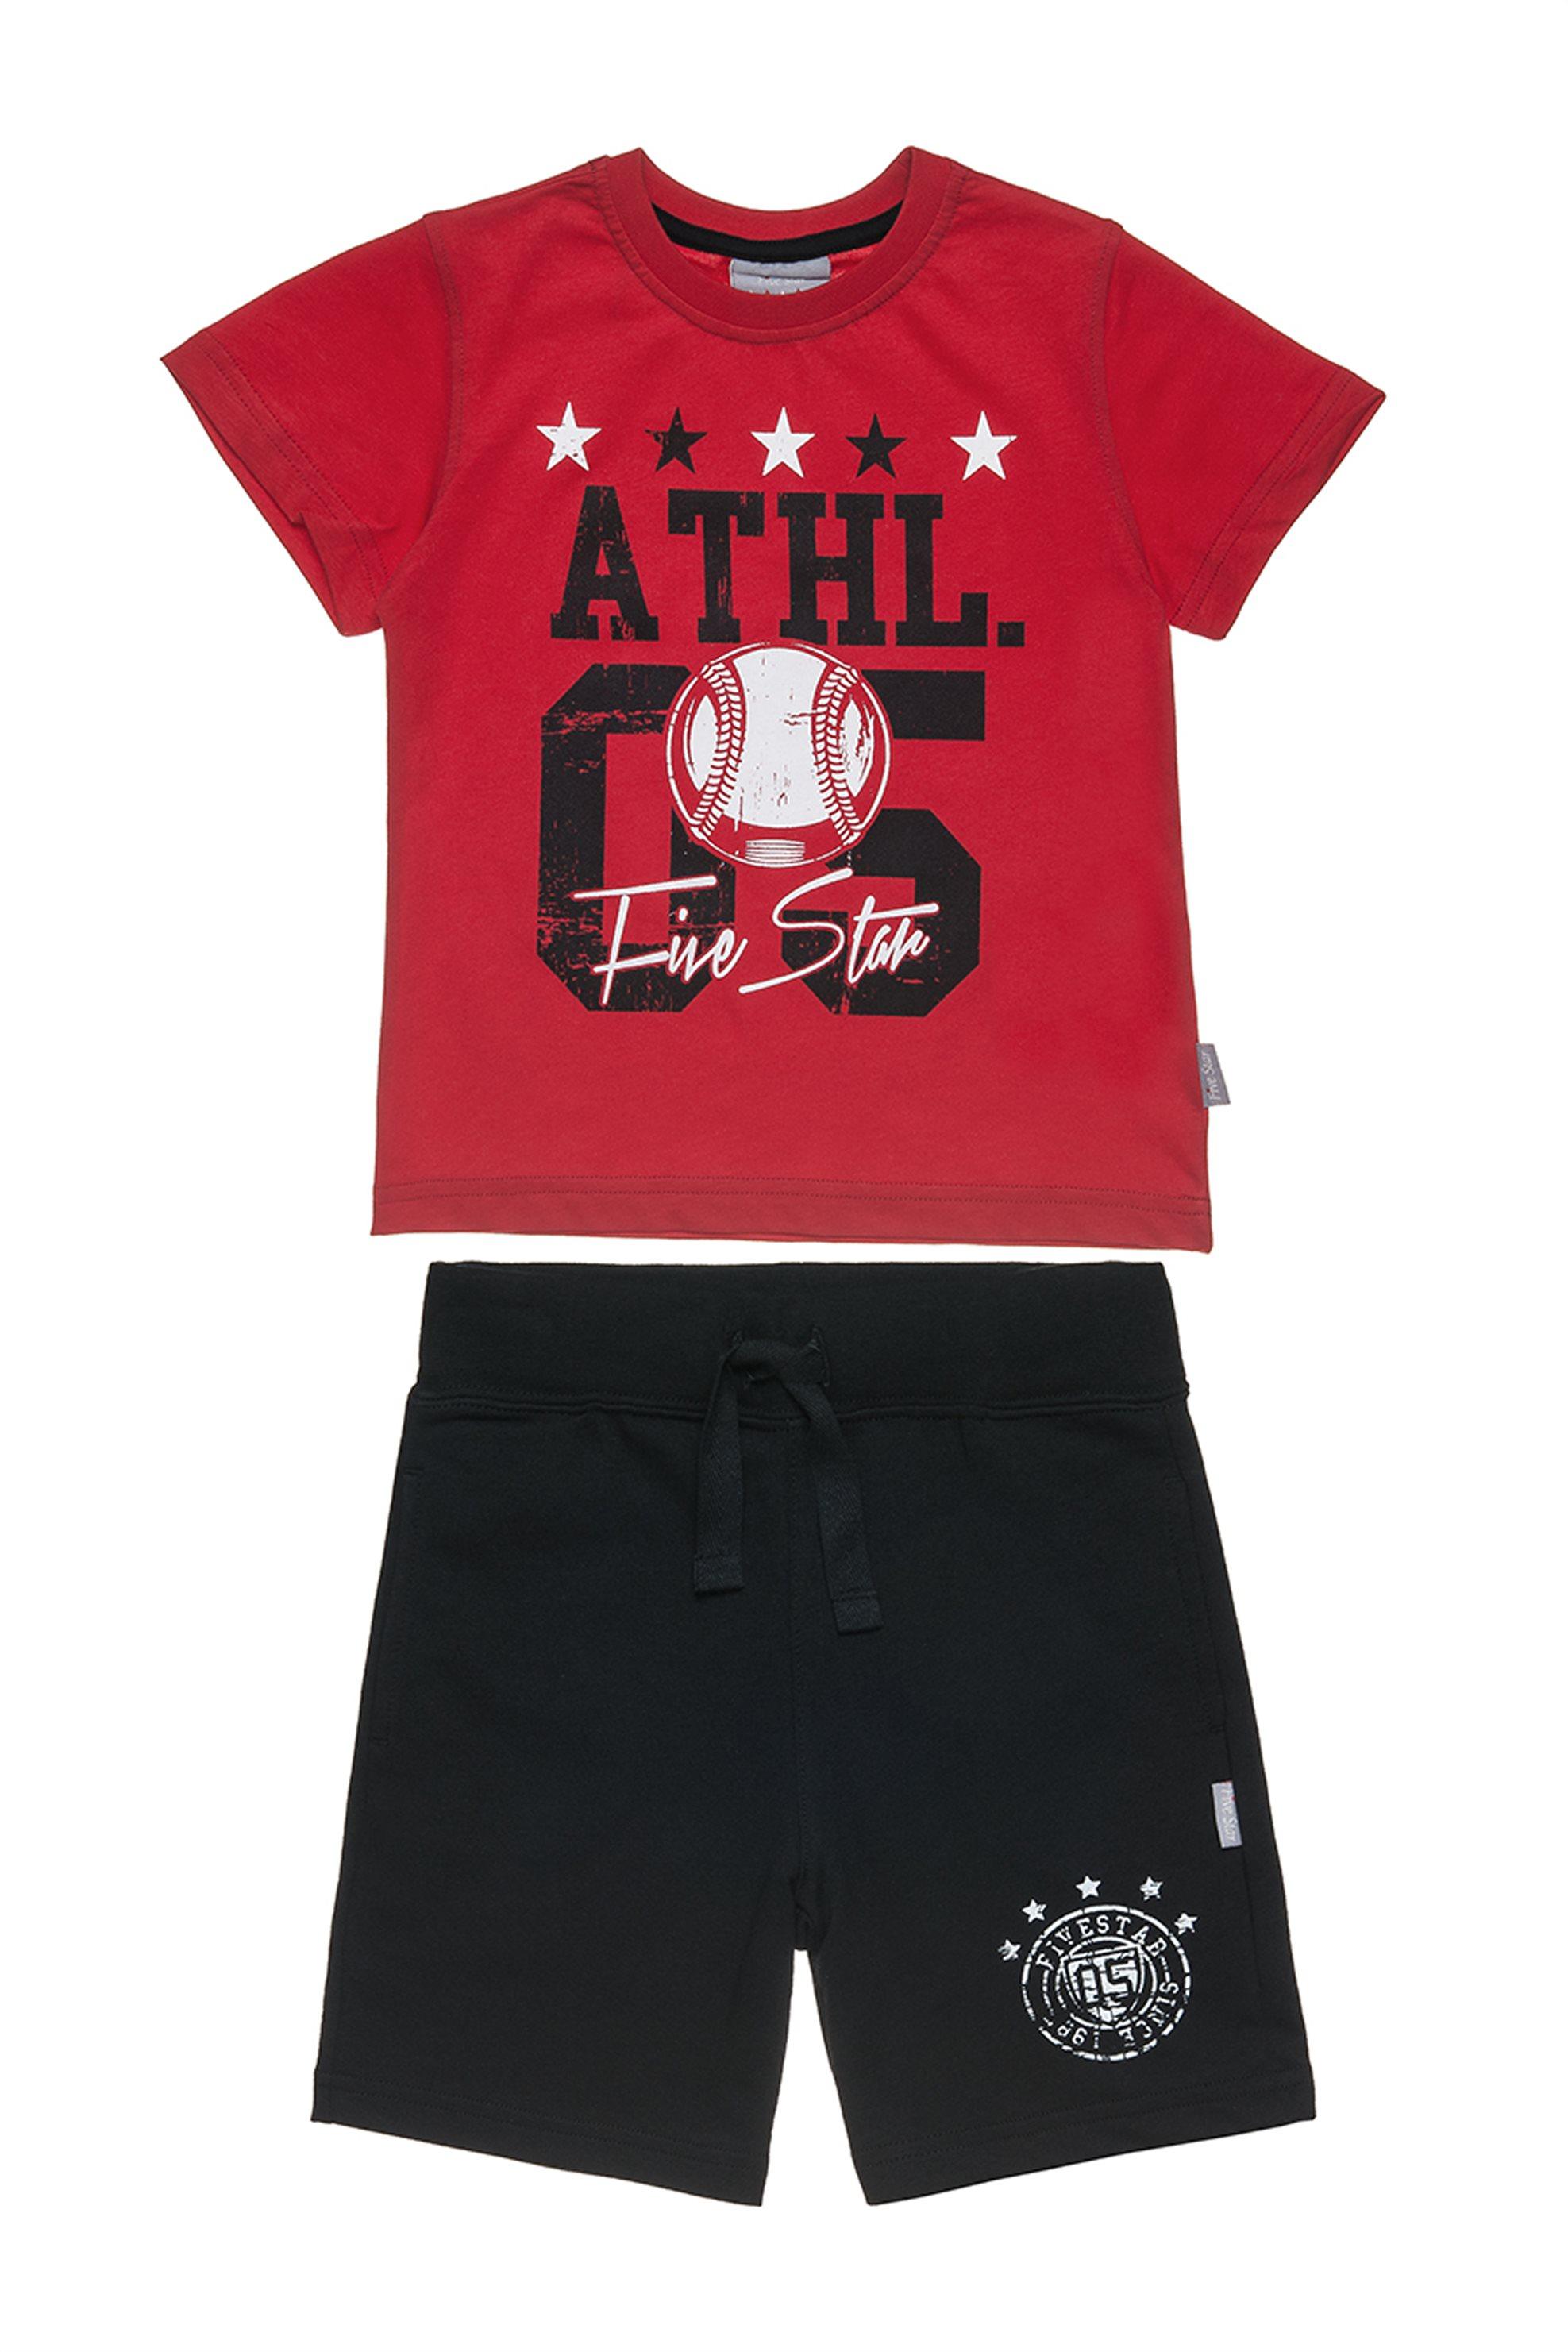 23e0a94462 Alouette παιδικό σετ T-shirt και βερμούδα με τύπωμα Five Star (2-5